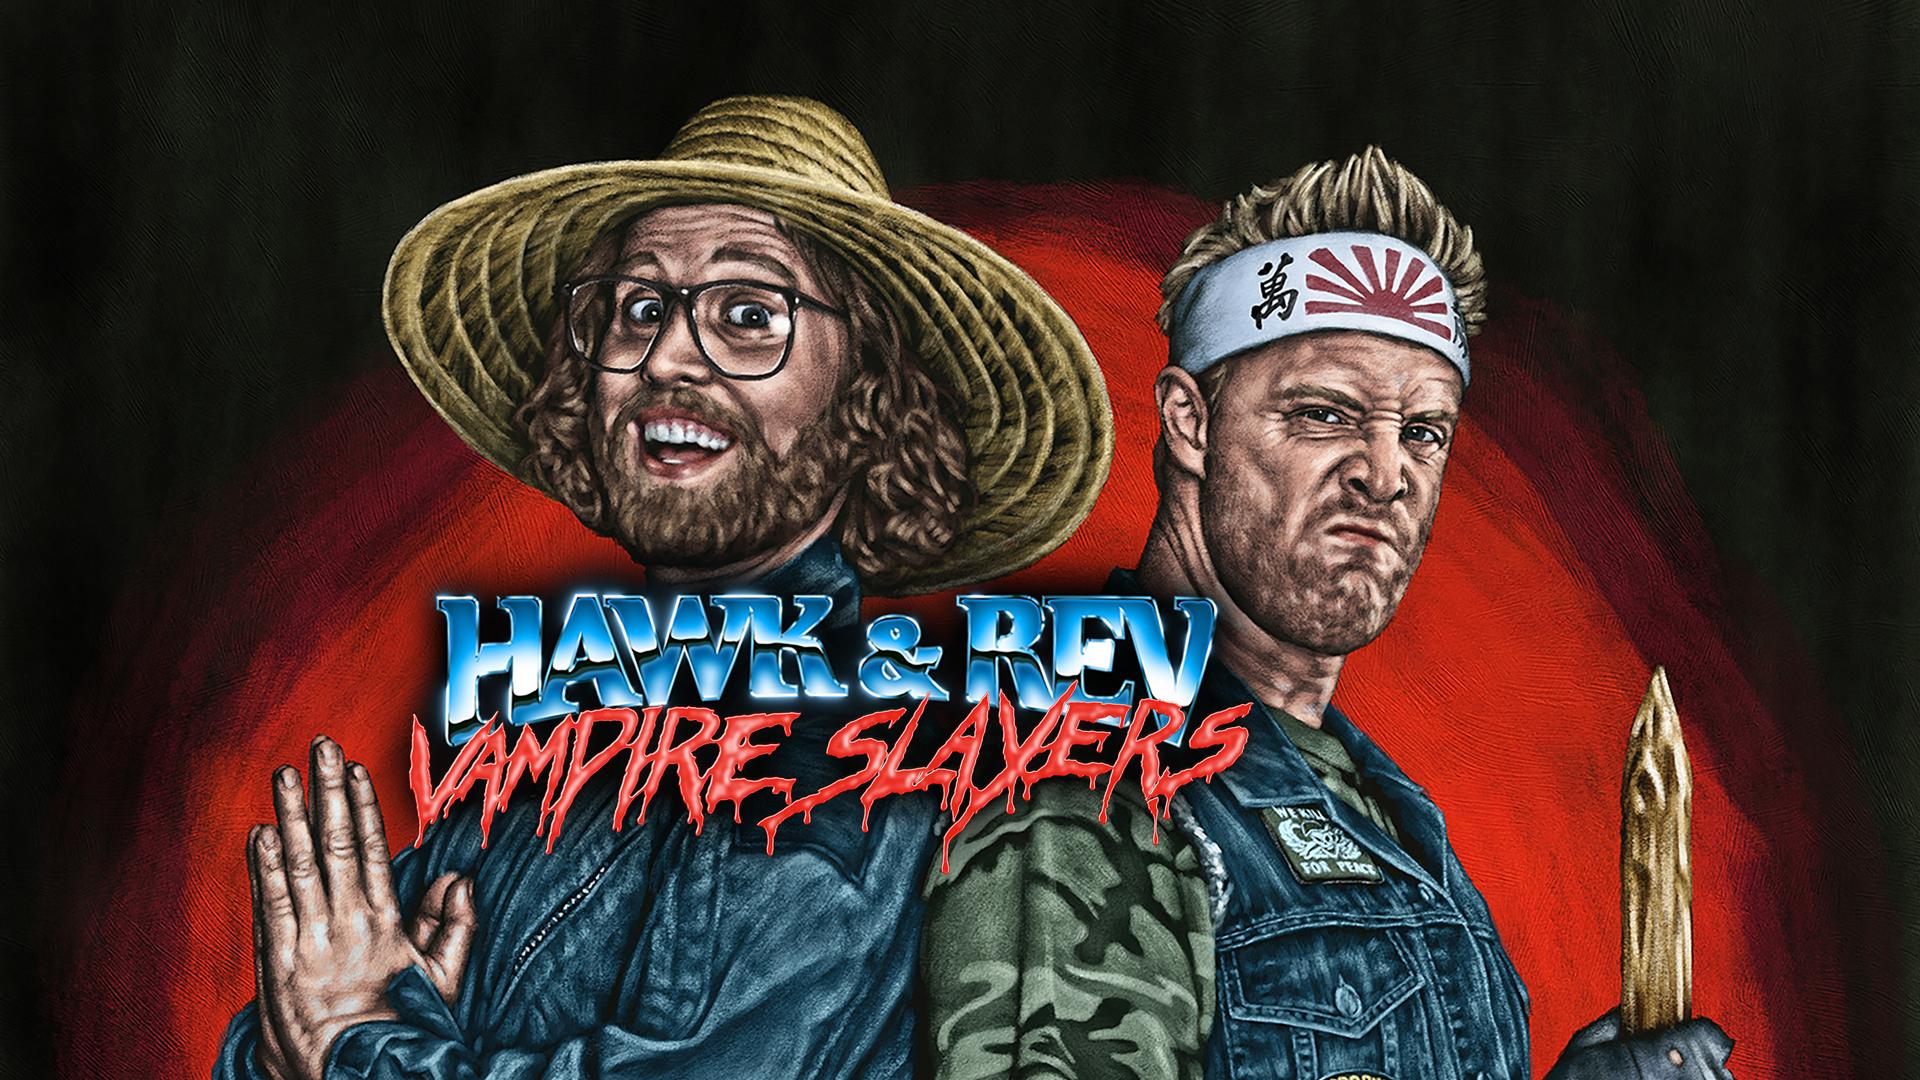 Hawk & Rev: Vampire Slayers